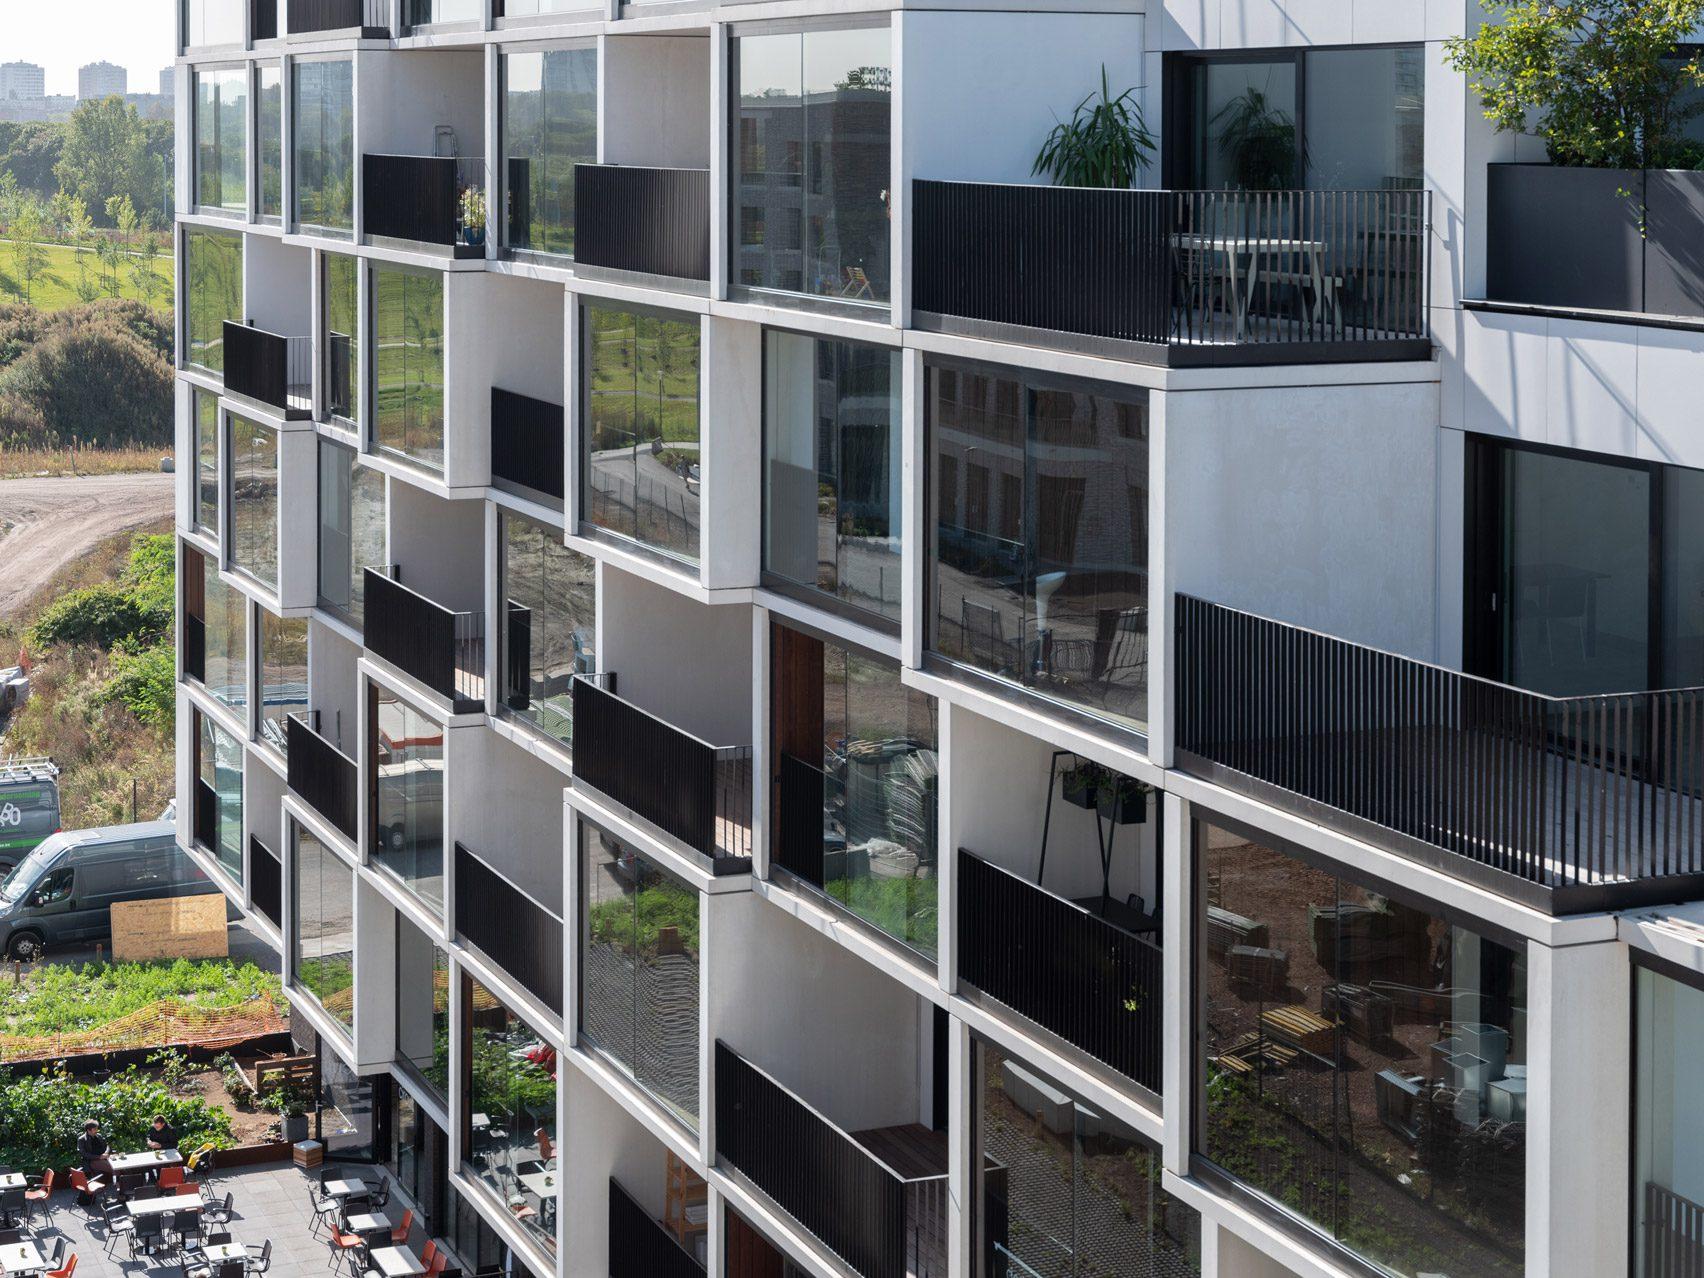 Balconies of Palazzo Verde housing